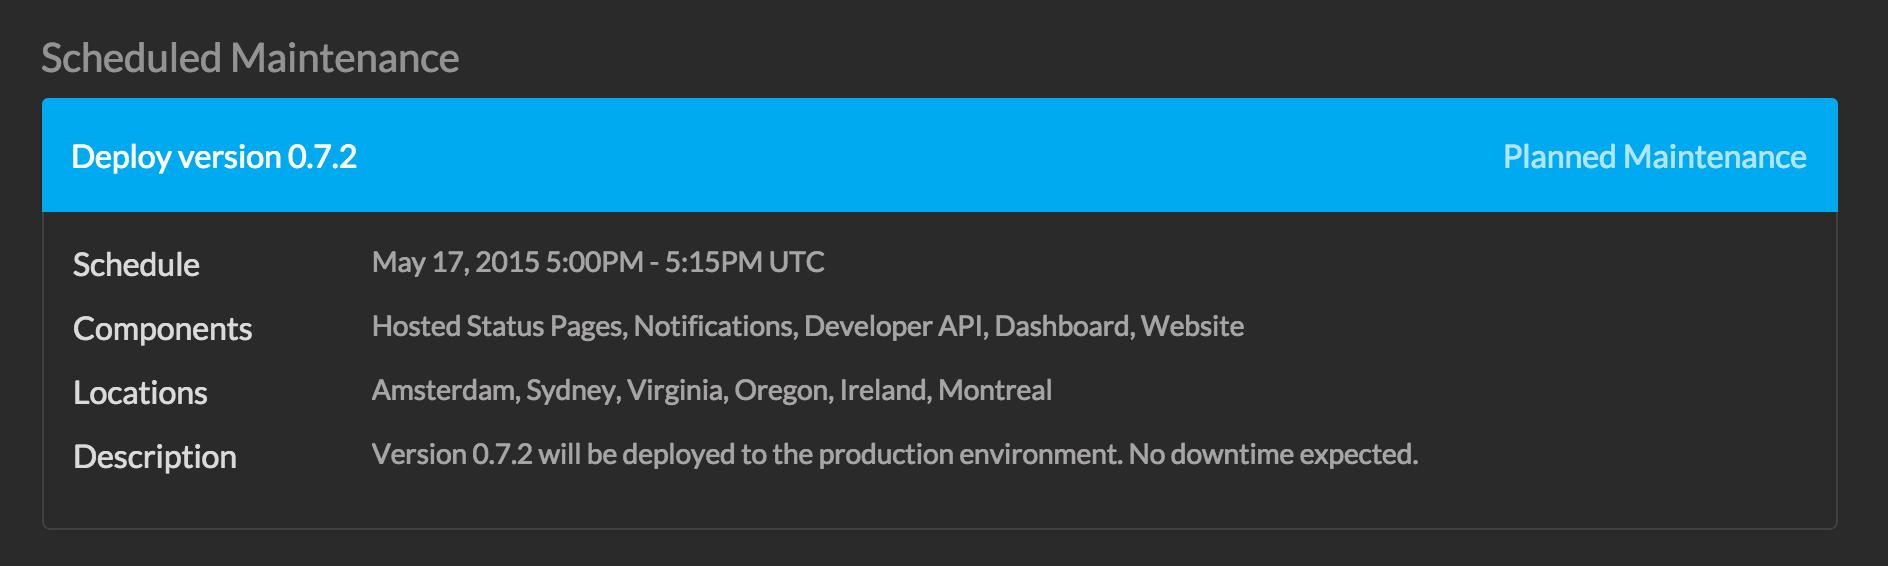 scheduled-maintenance-example